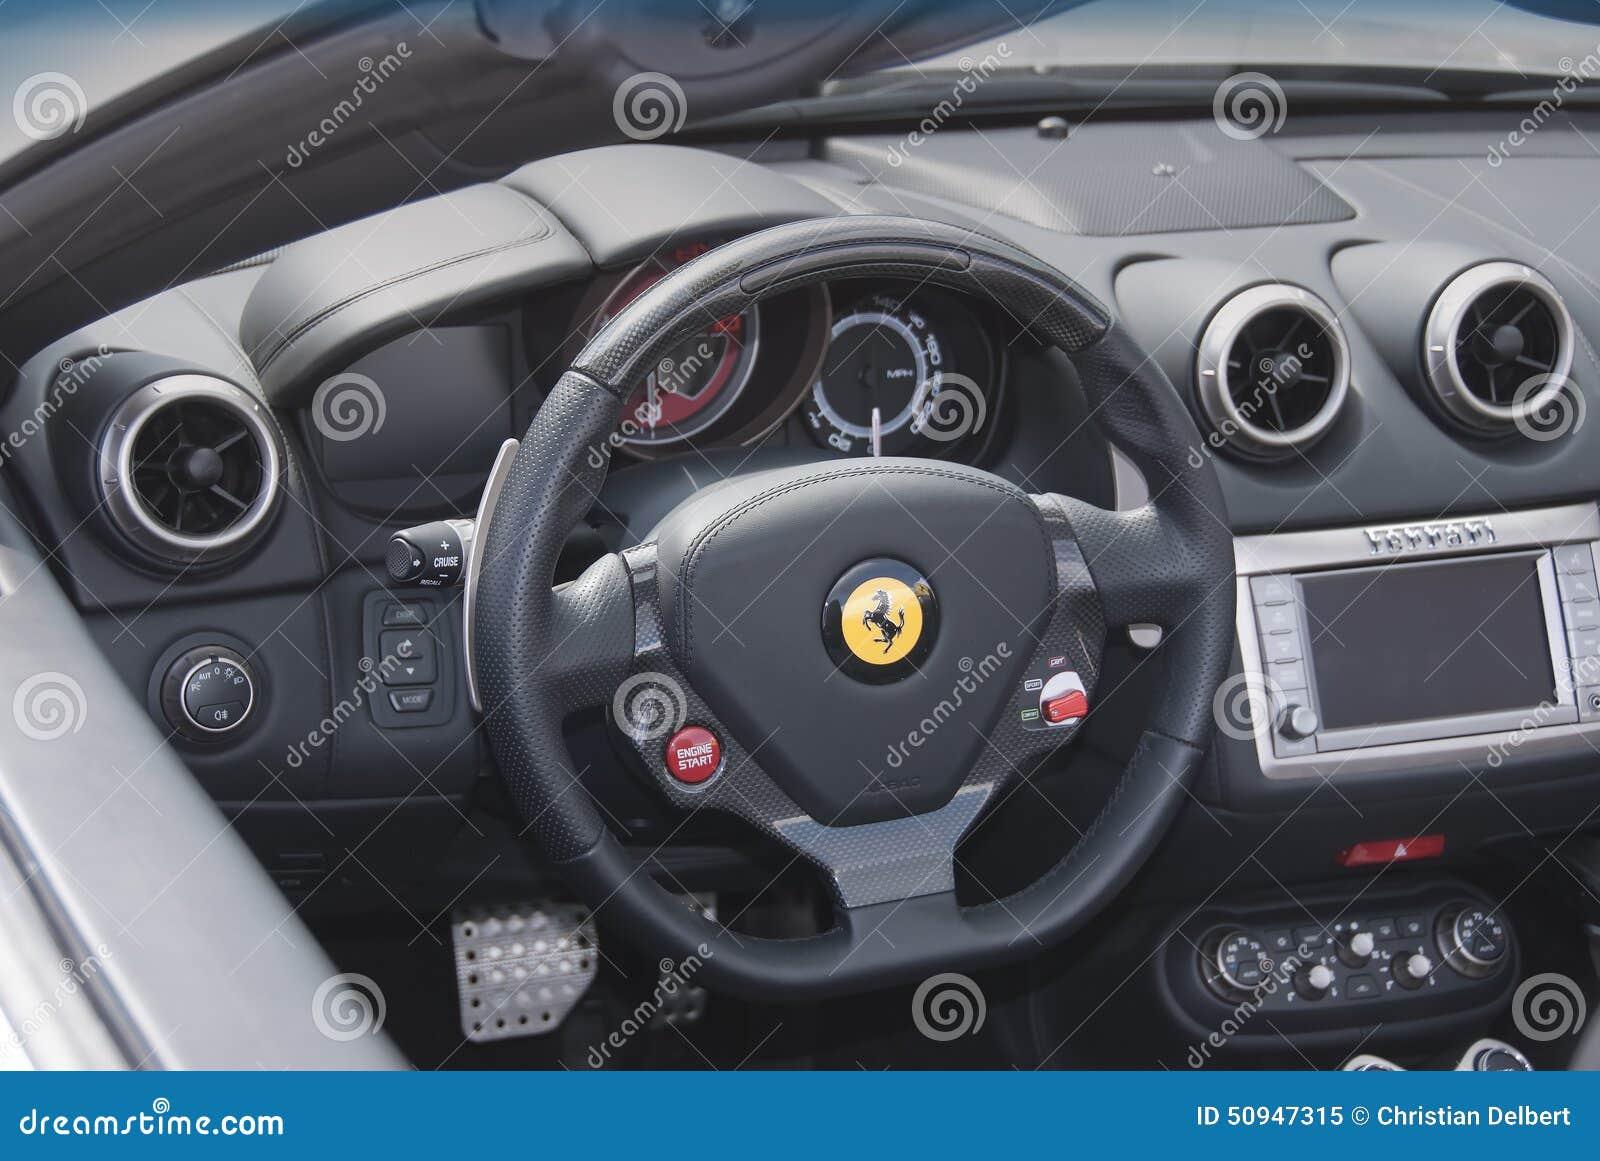 Ferrari Dashboard And Interior Editorial Image Image Of Interior